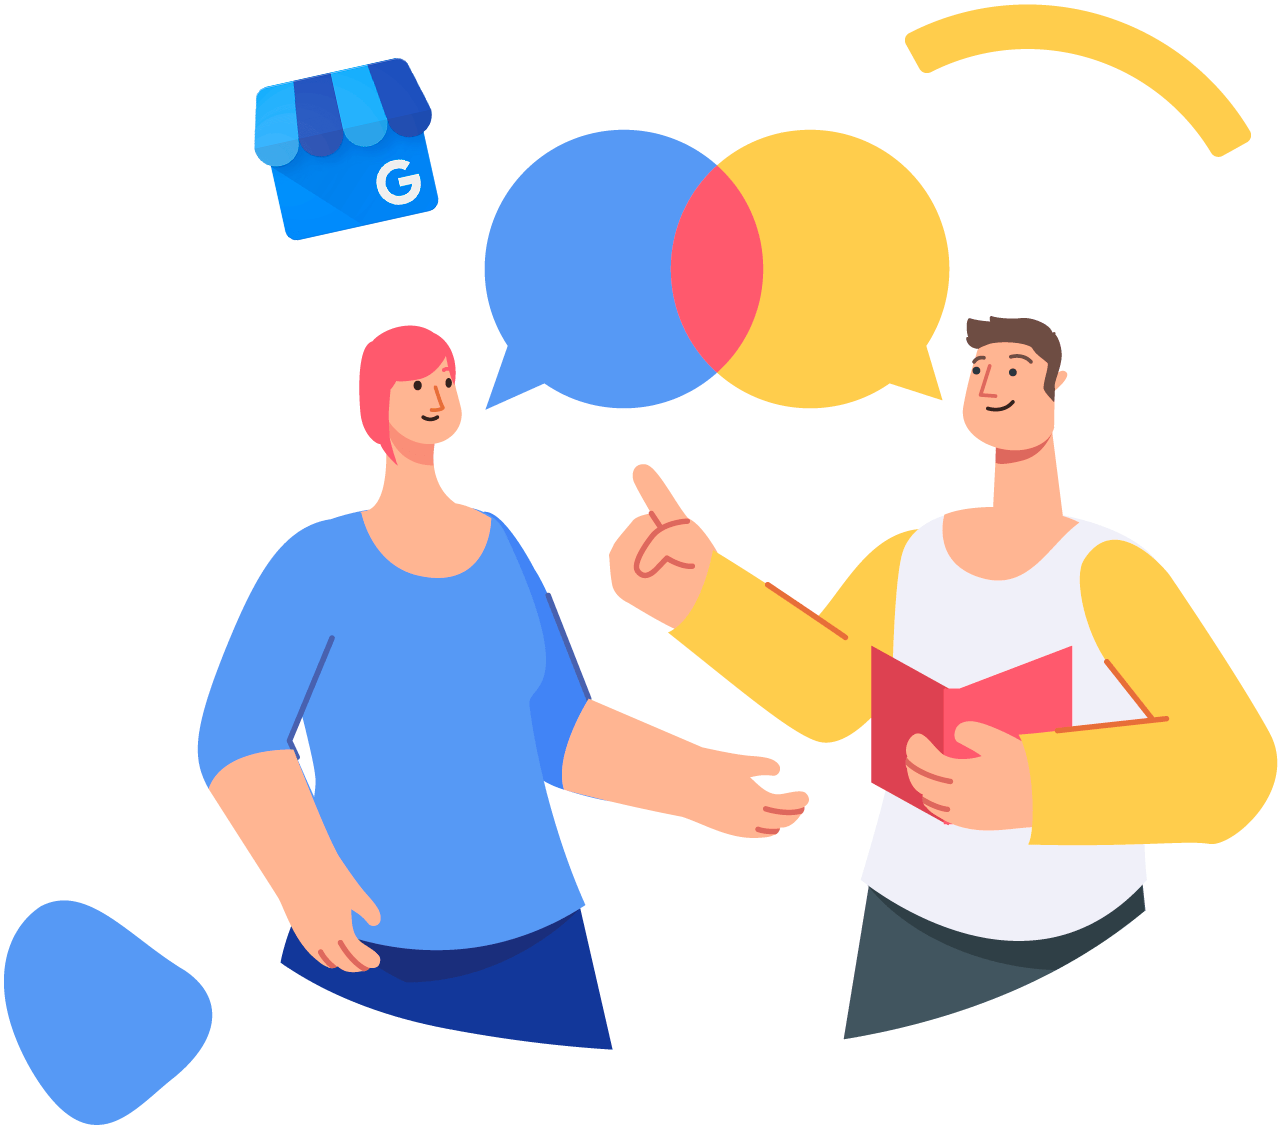 ¿Cómo optimizar un perfil de Google My Business?